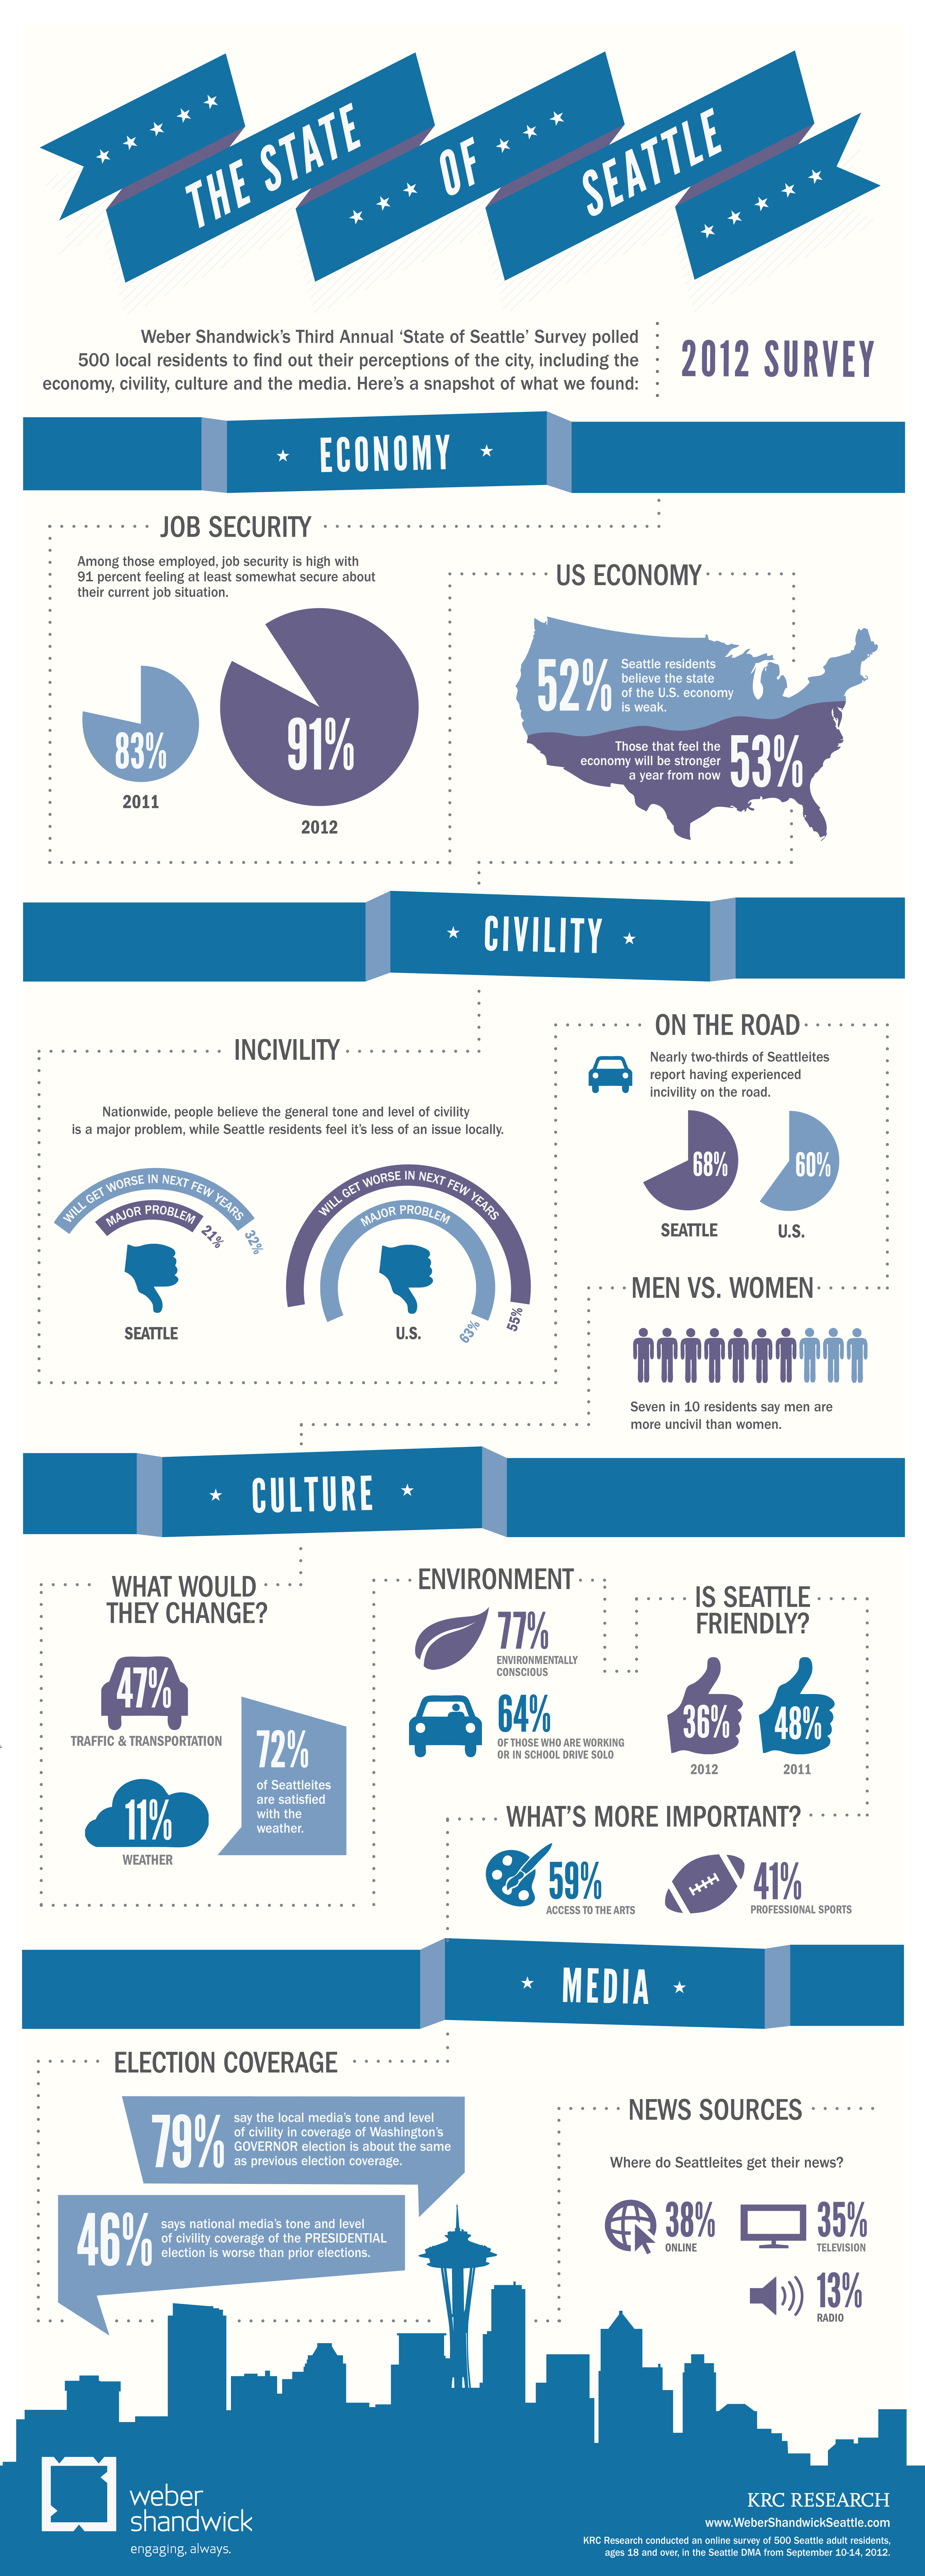 WSW_SeattleSurvey_Infographic